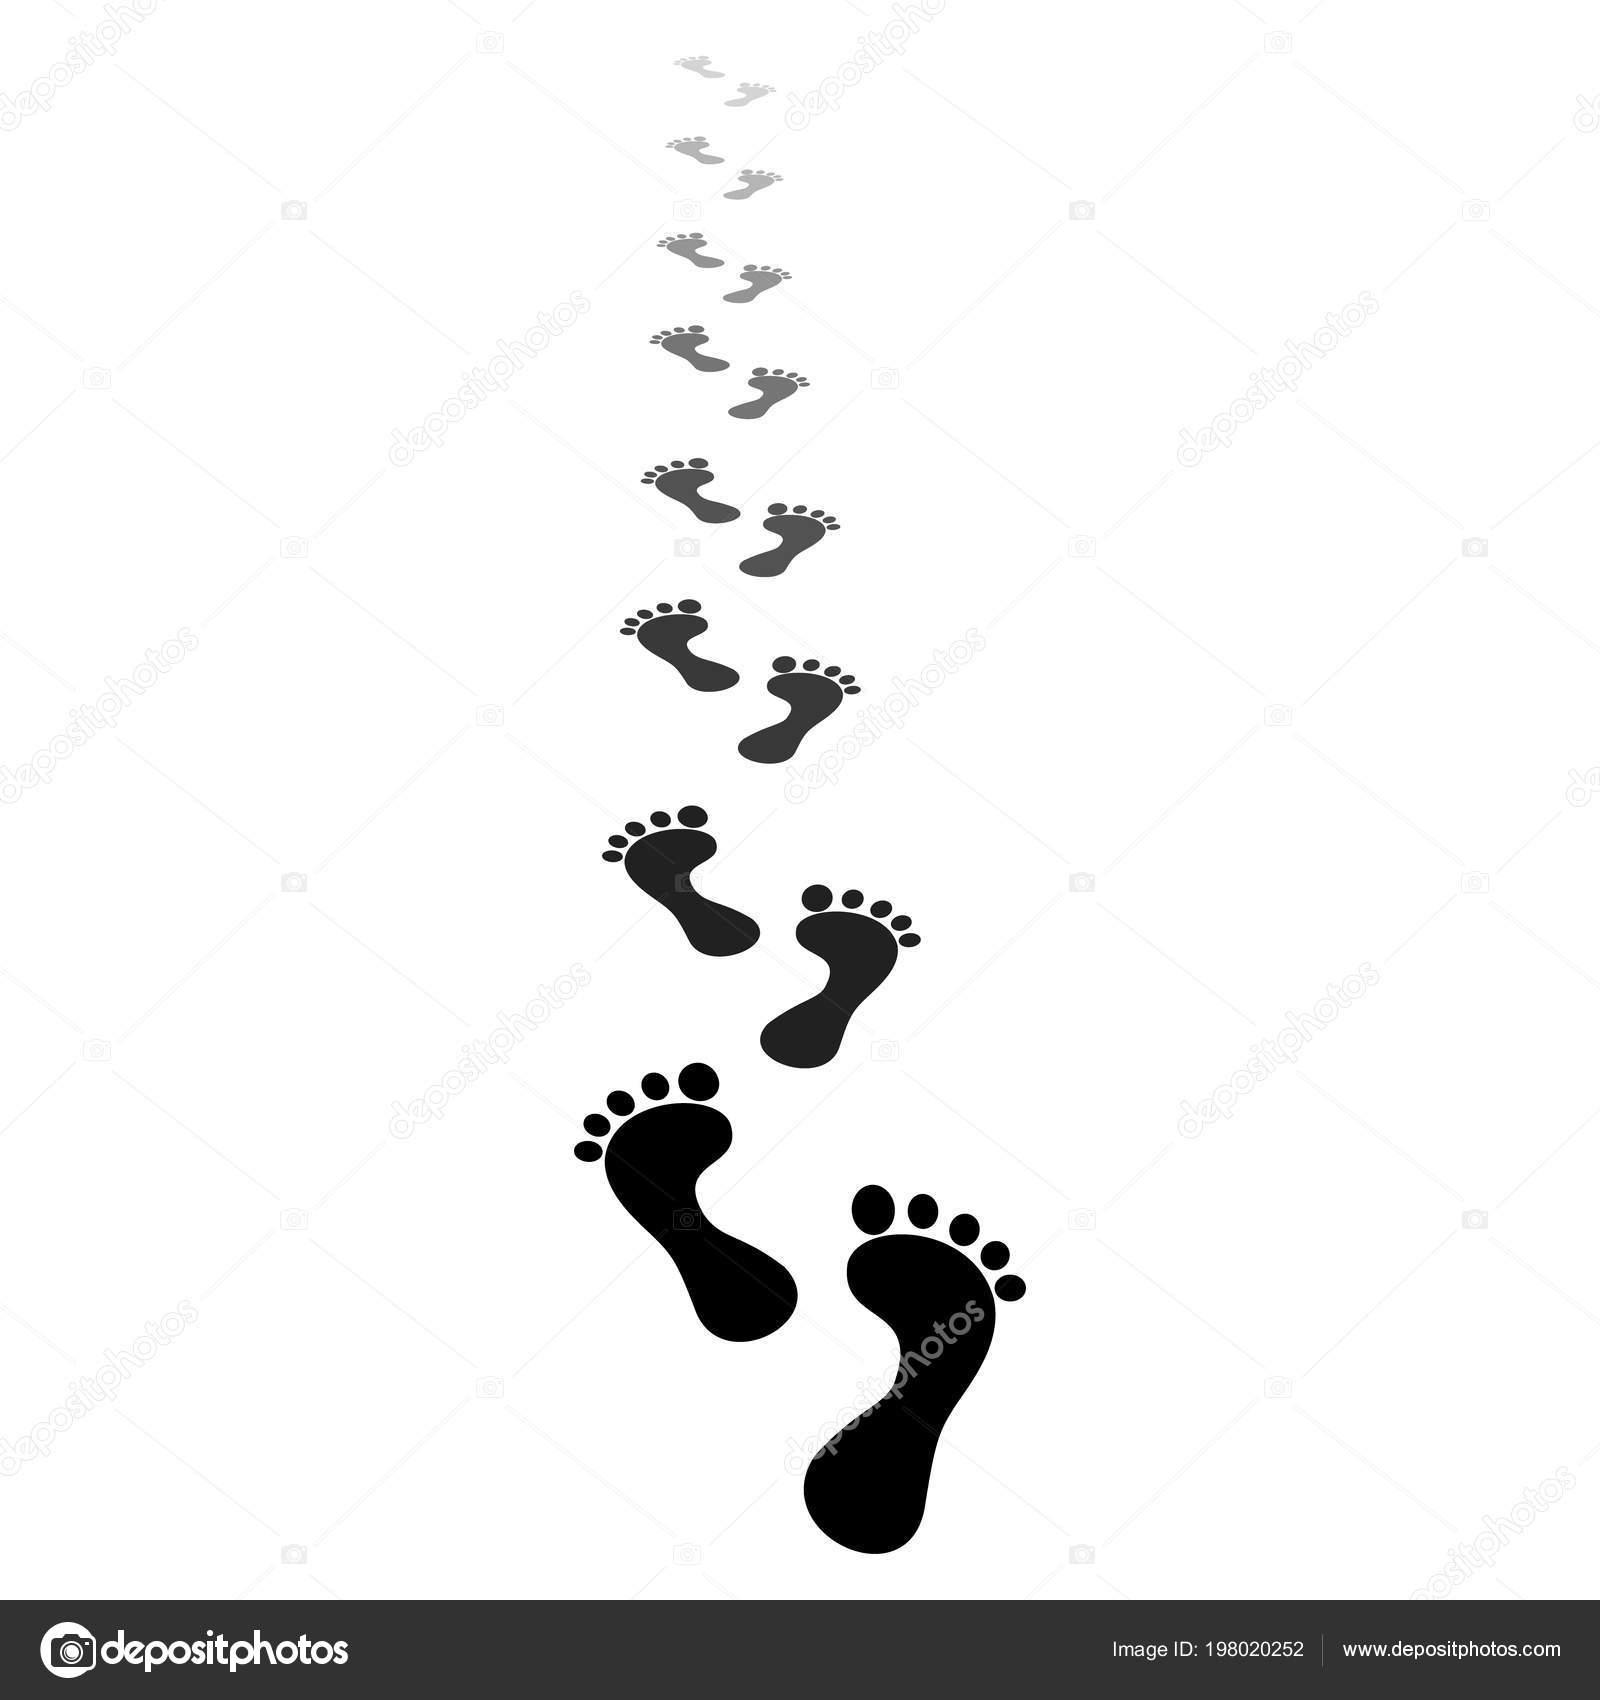 black silhouette human footprint footprints of bare feet walking